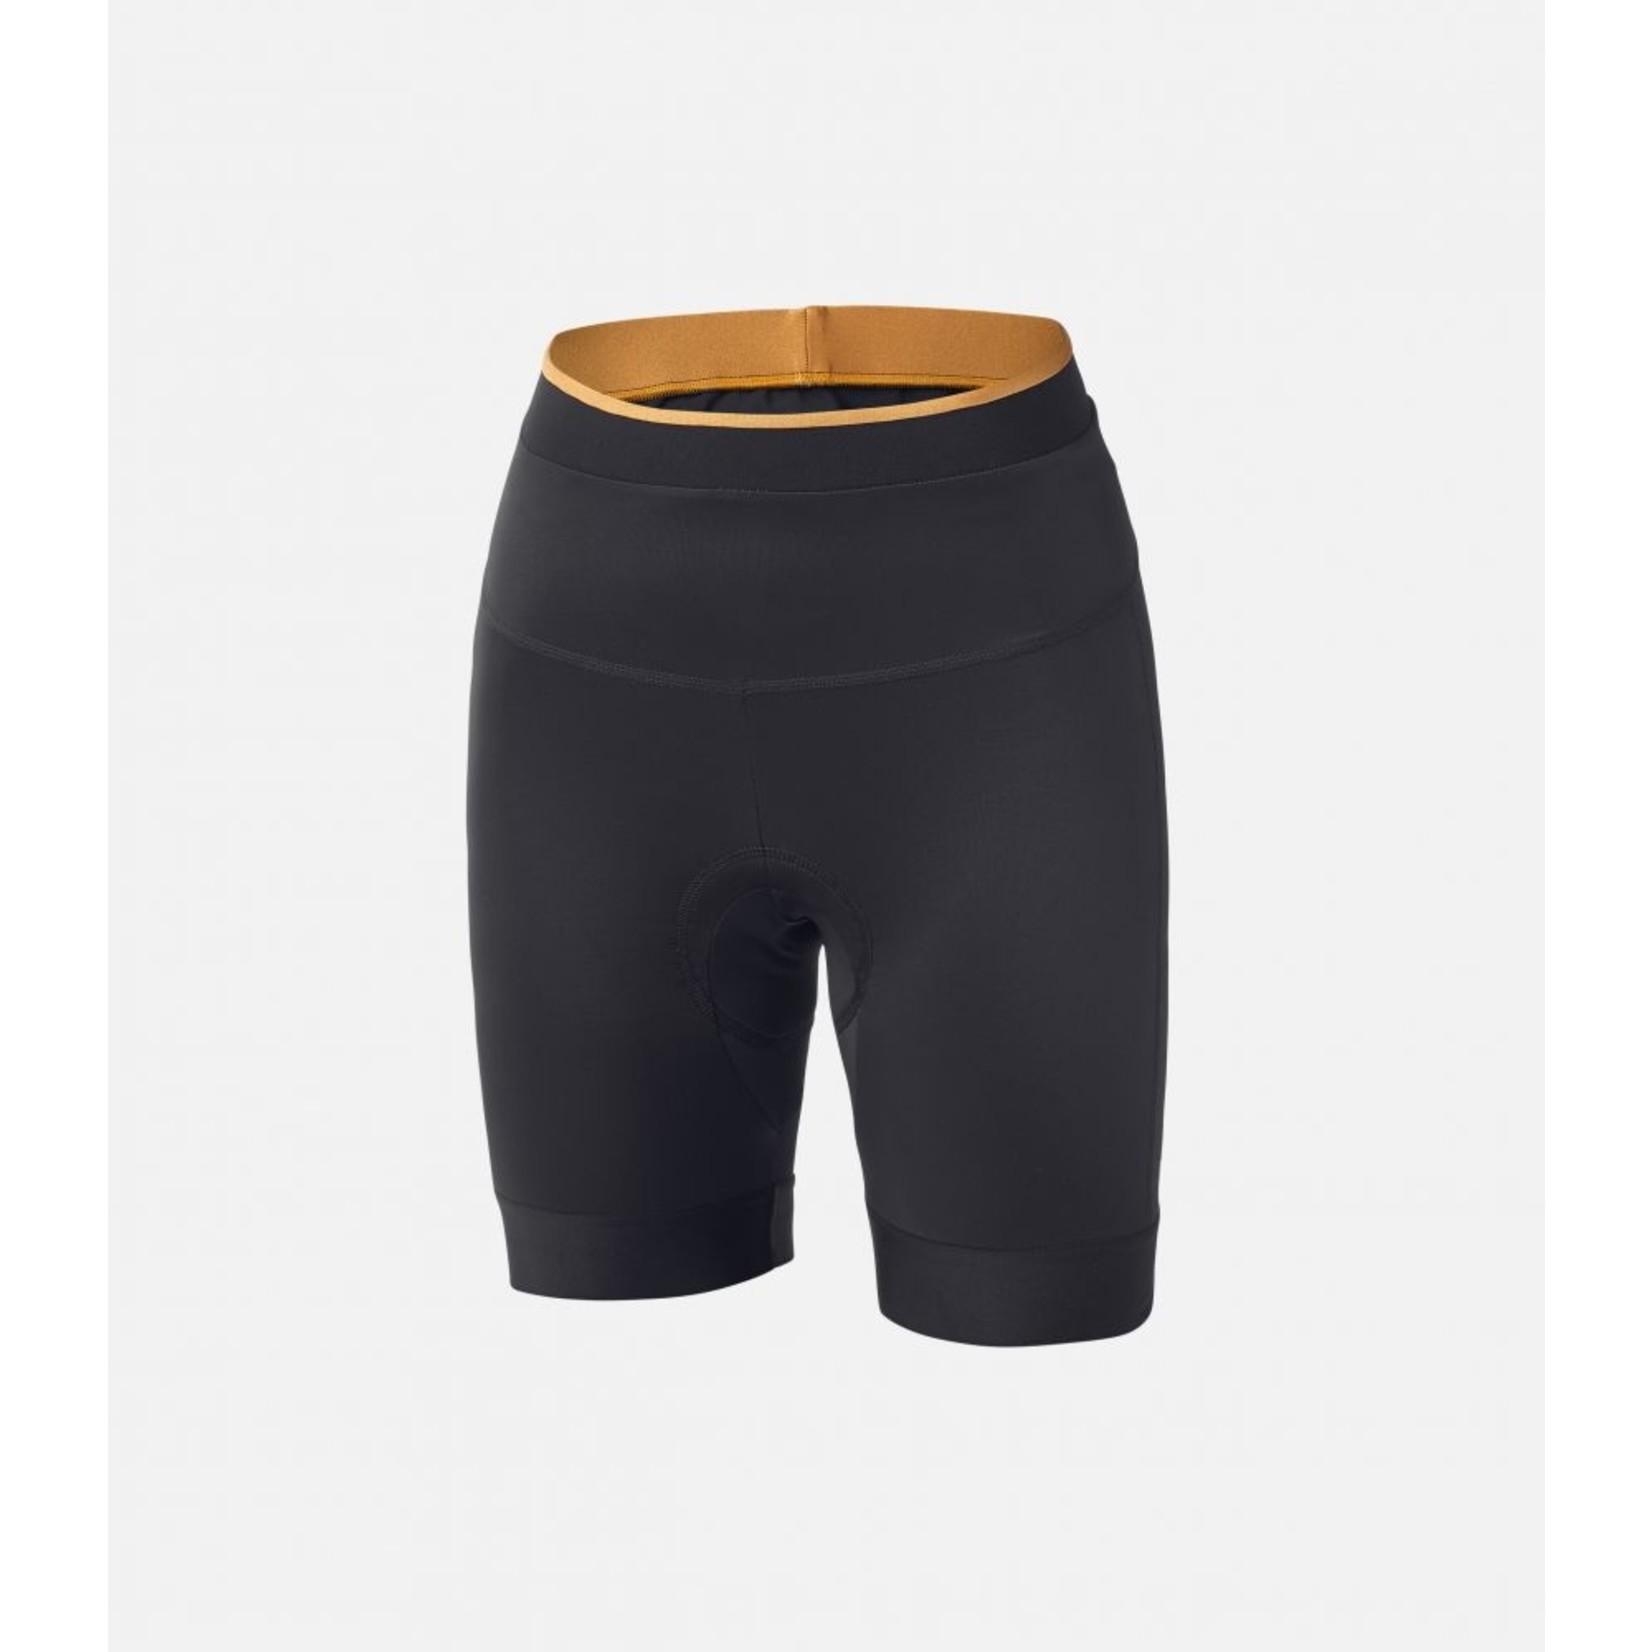 PEdALED PEdALED Women Shizen Shorts L